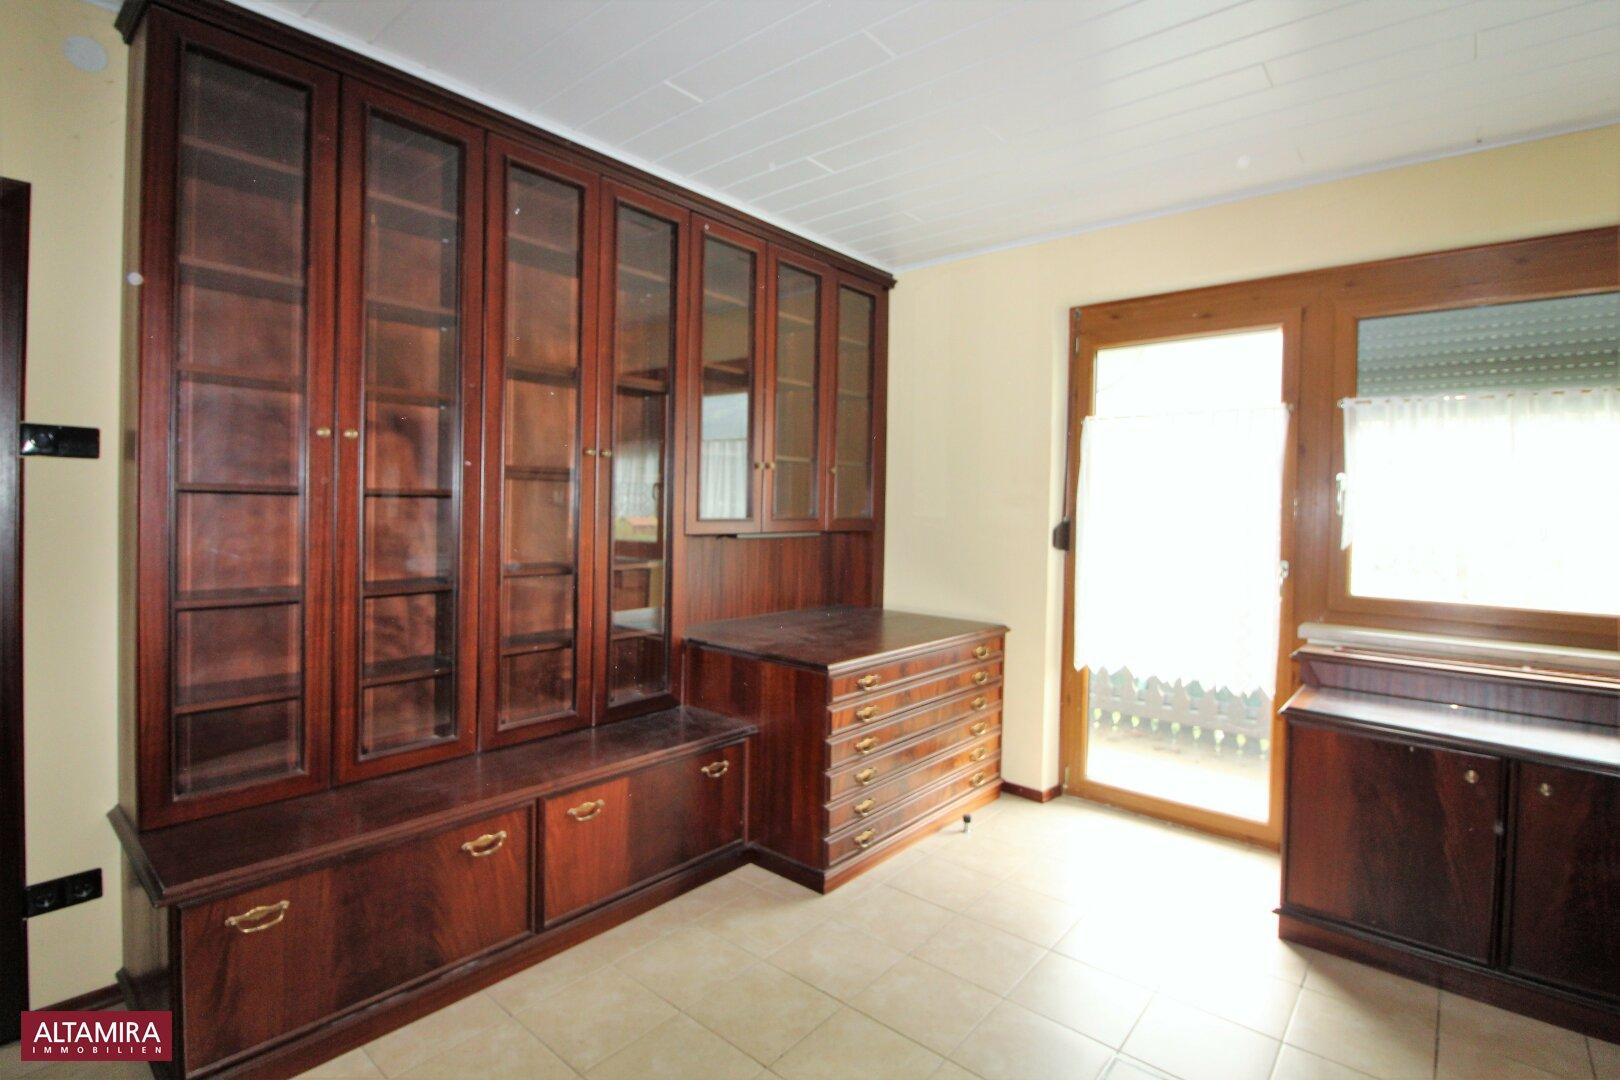 Zimmer 3 mit Balkonausgang